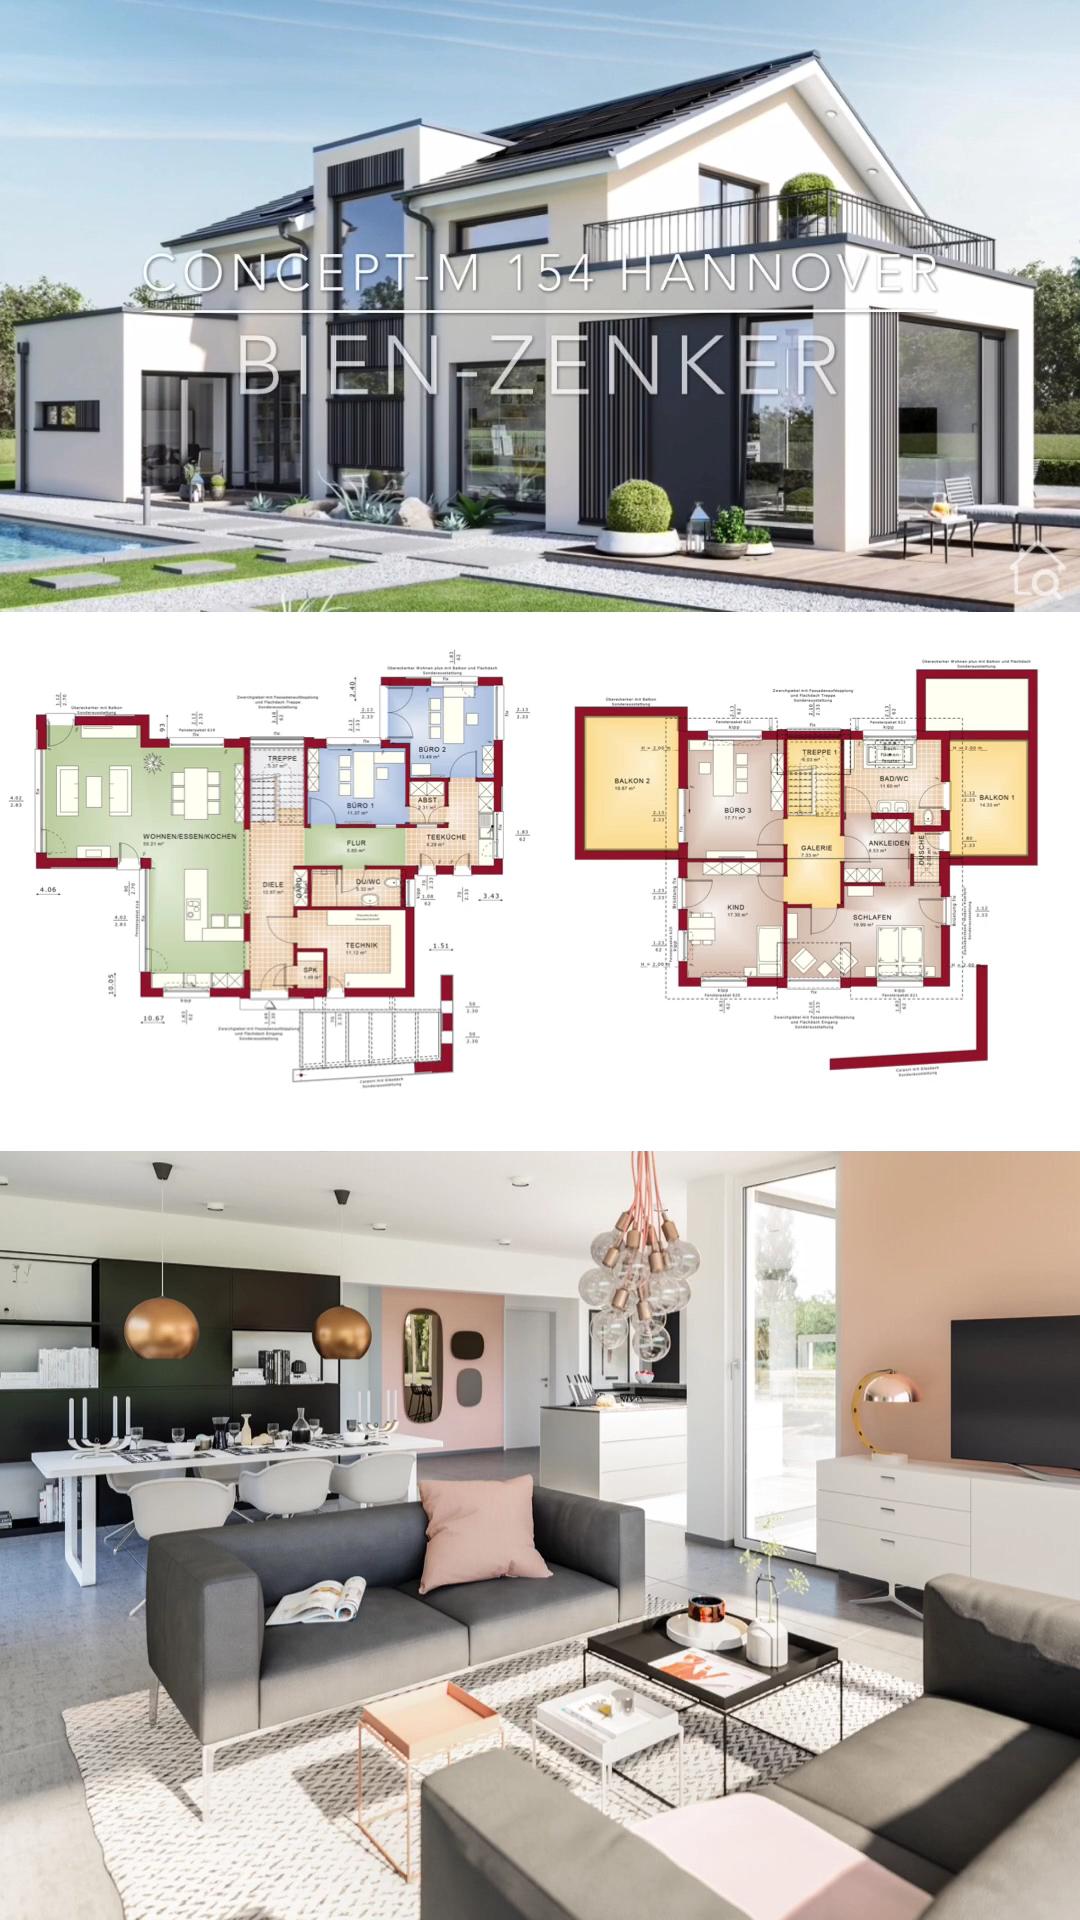 Modern European House Architecture Design Floor Plan Ideas 2storeyhousedesign Americanhous Family House Plans Modern House Plans Modern Style House Plans